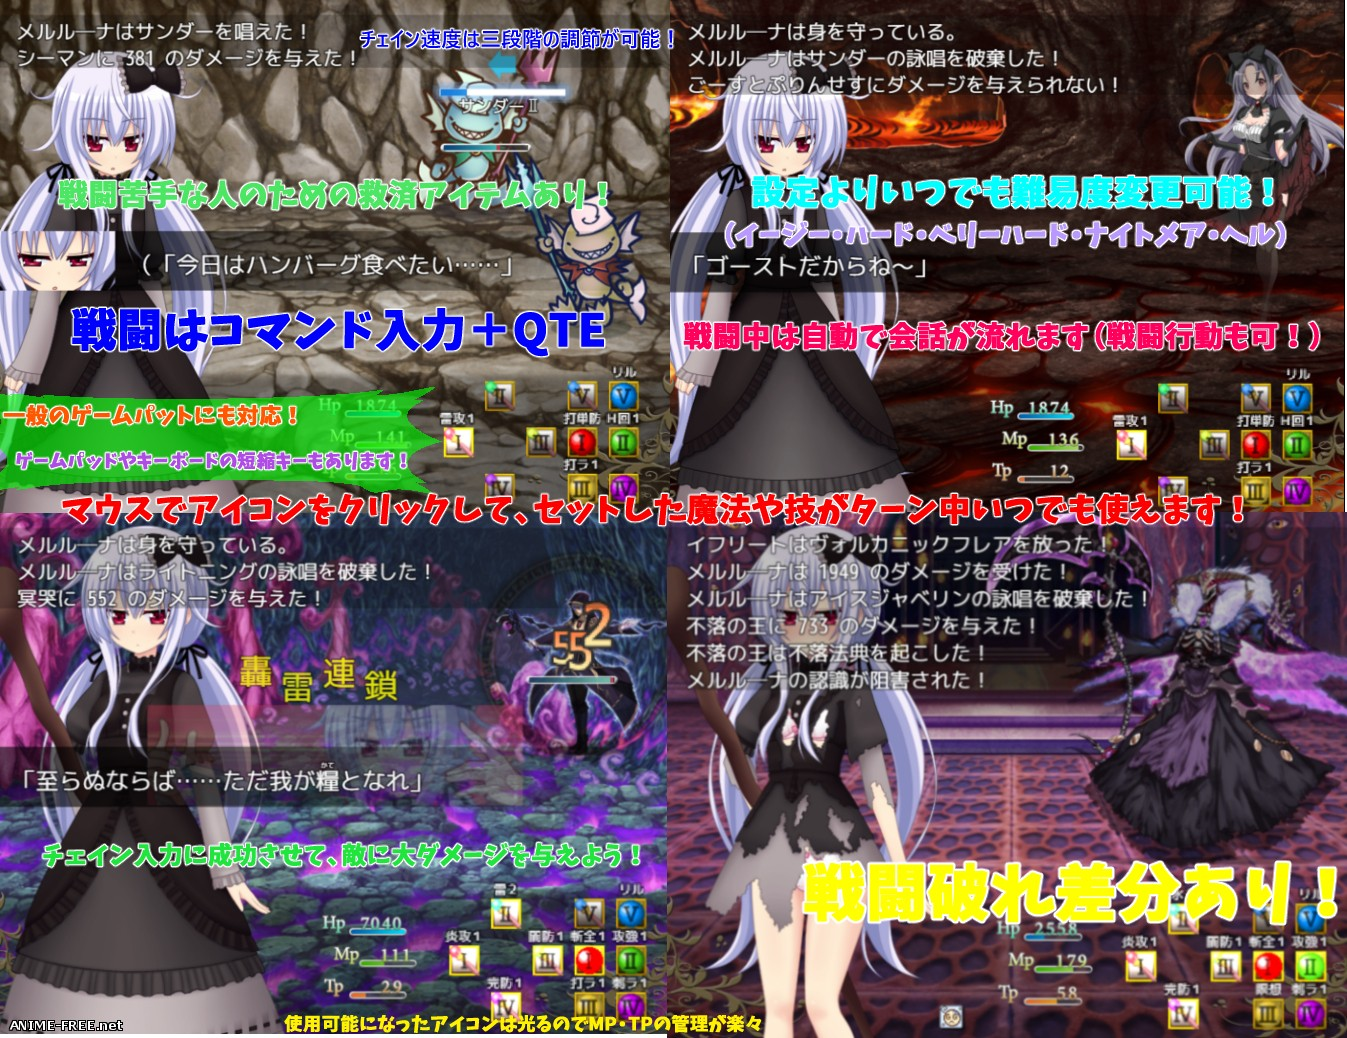 Kuroki Inori ~Meikoku no Meluluna~ [2016] [Cen] [jRPG] [JAP] H-Game